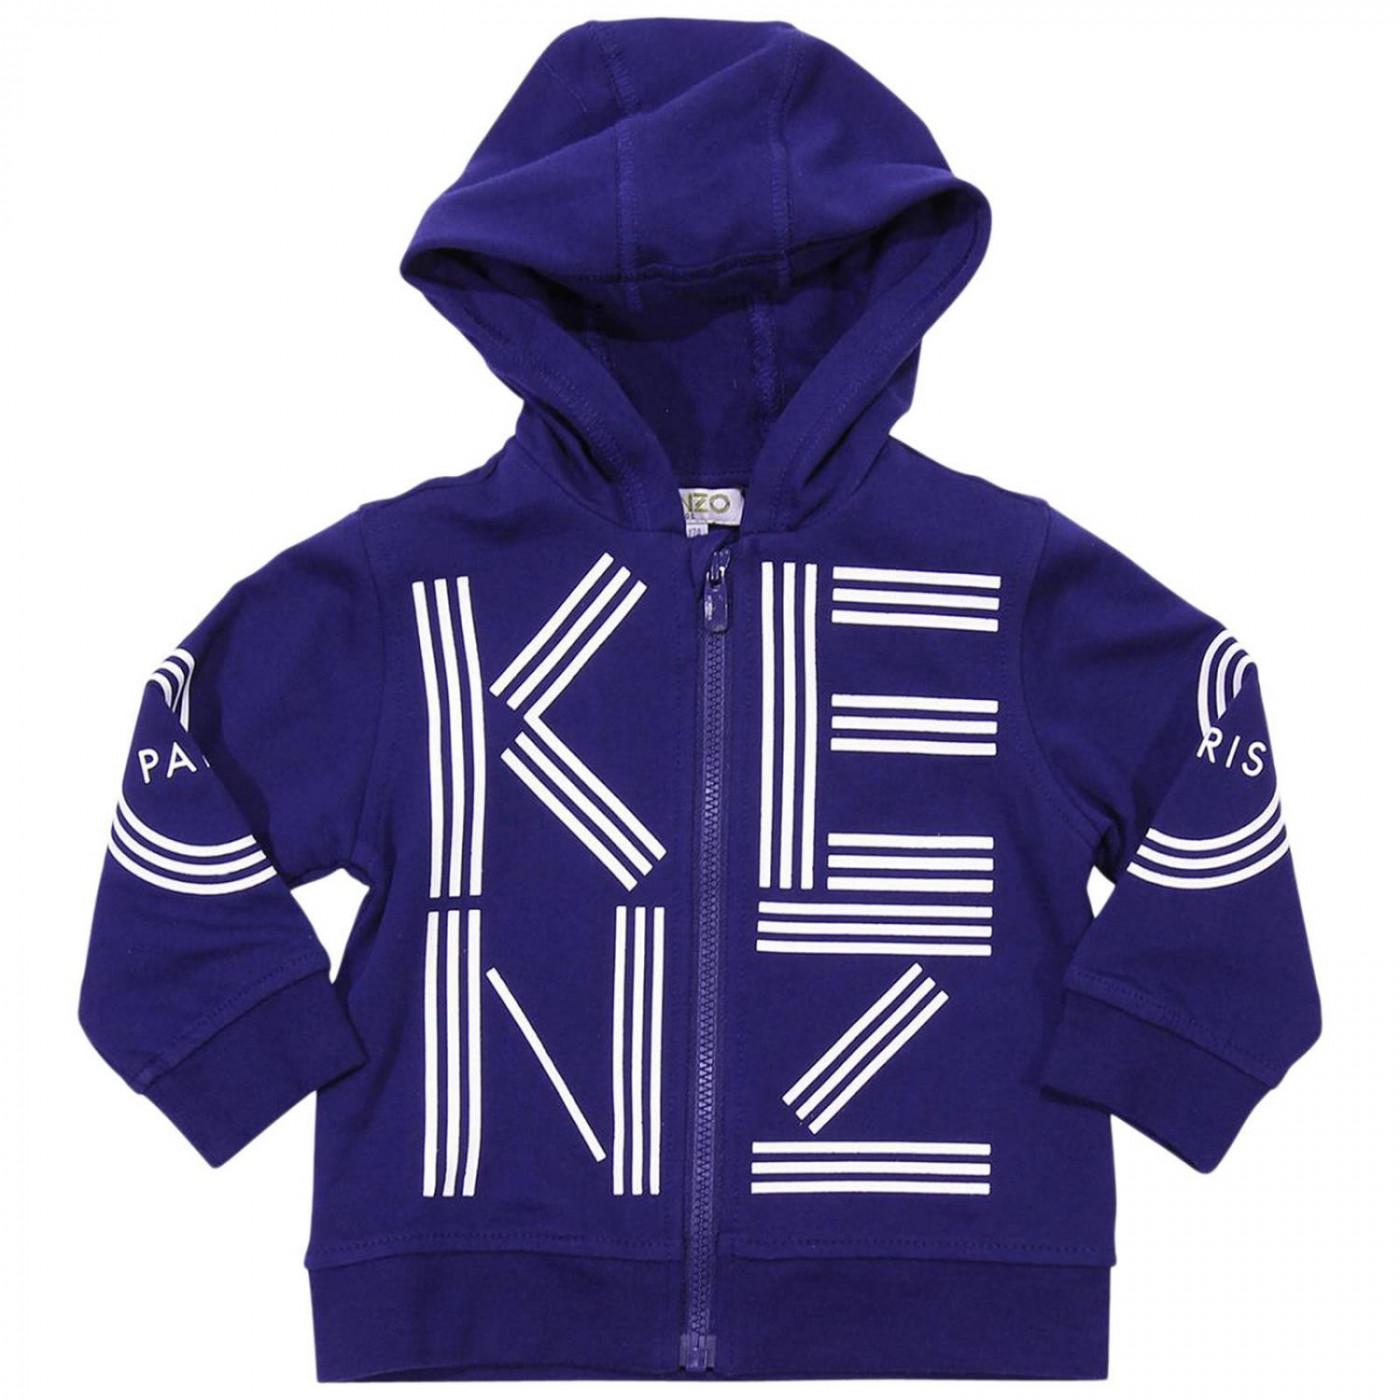 Толстовка Kenzo KL17507-49